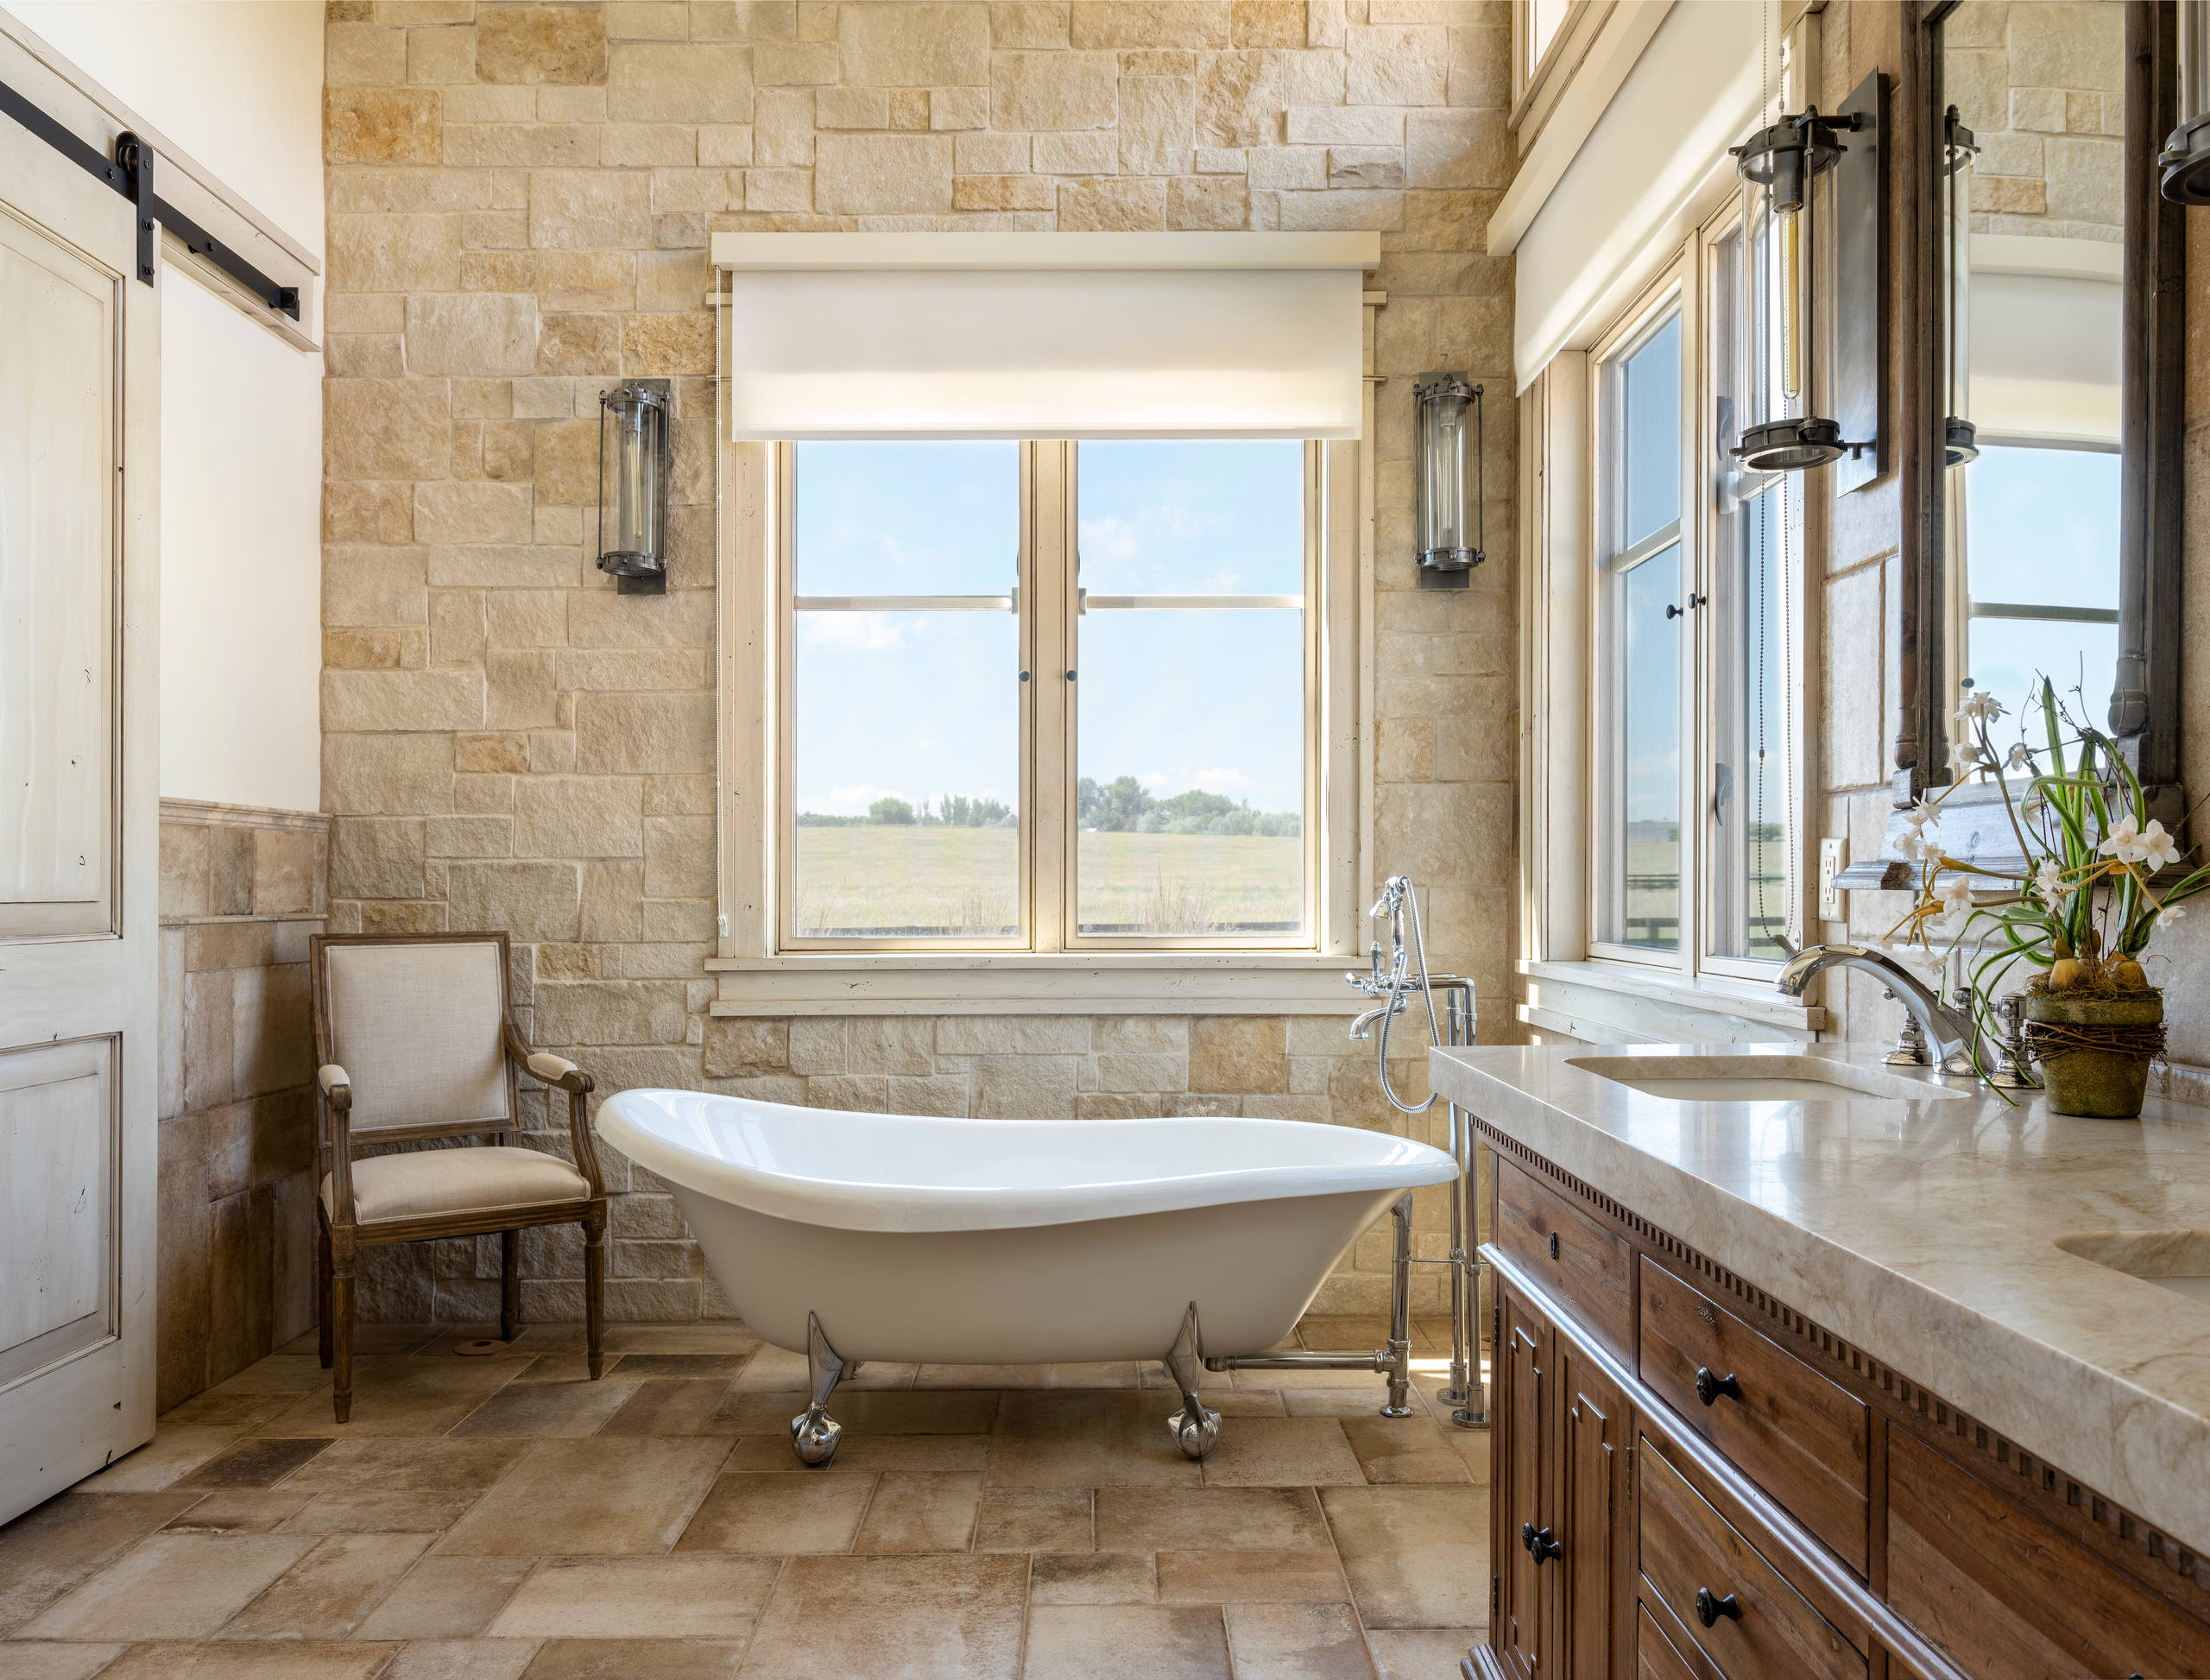 75 Beautiful Farmhouse Claw Foot Bathtub Pictures Ideas